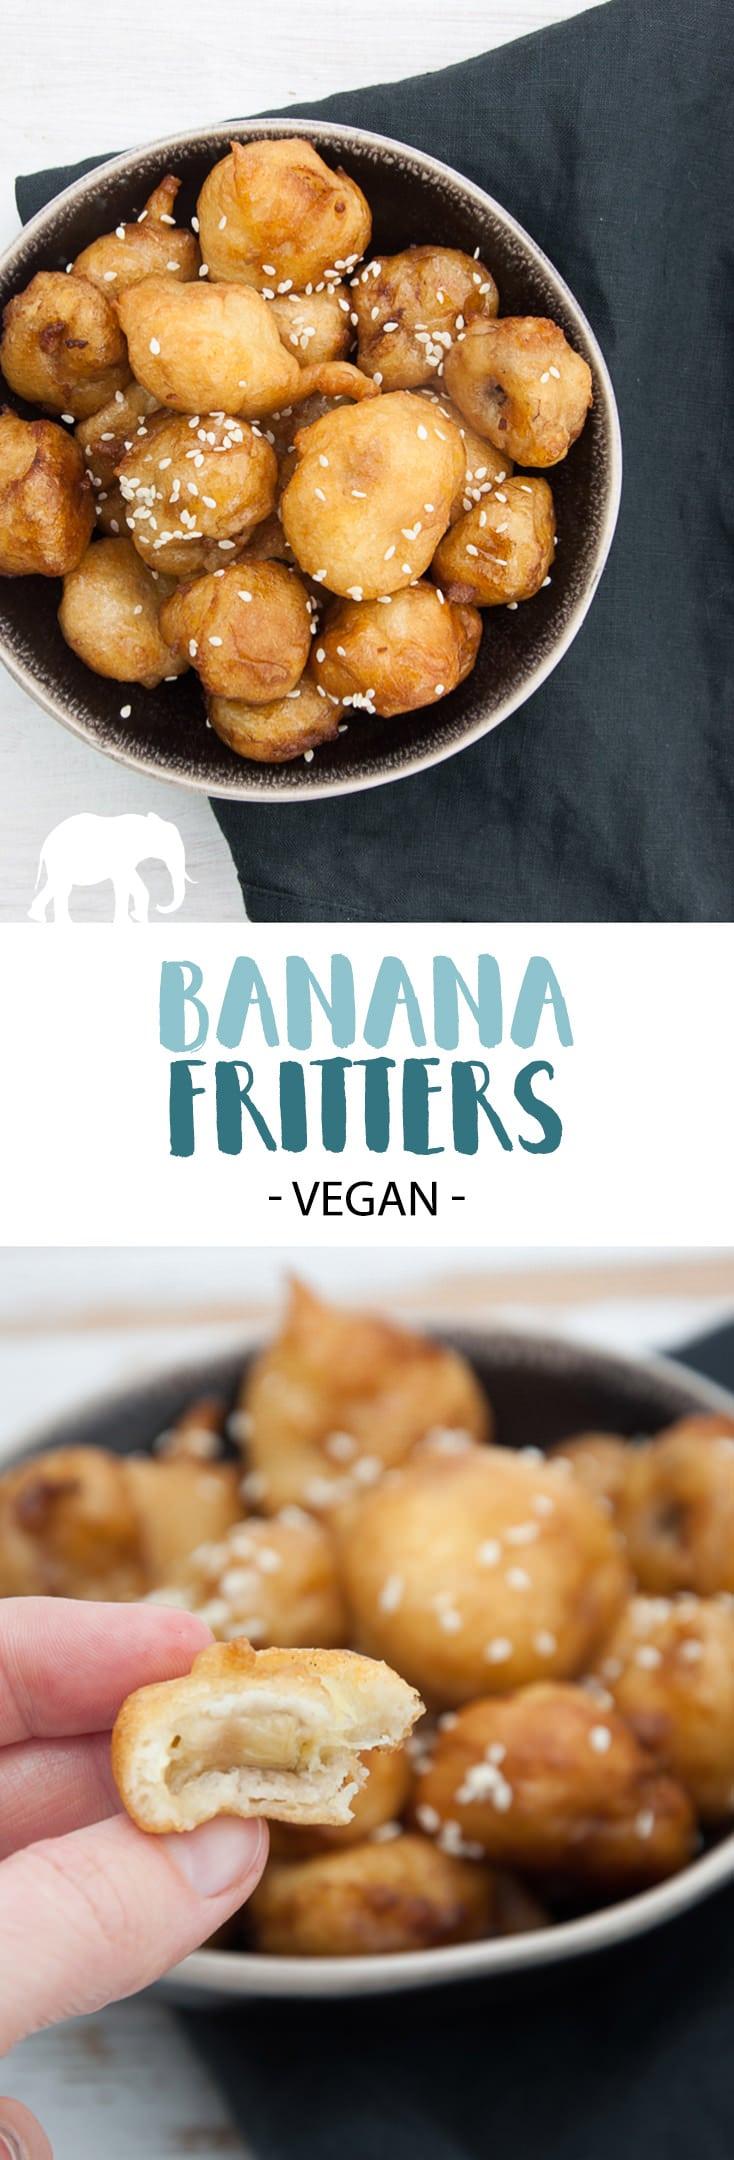 Vegan Banana Fritters coated in maple syrup and sprinkled with sesame seeds | ElephantasticVegan.com #vegan #banana #dessert #sweet #fried